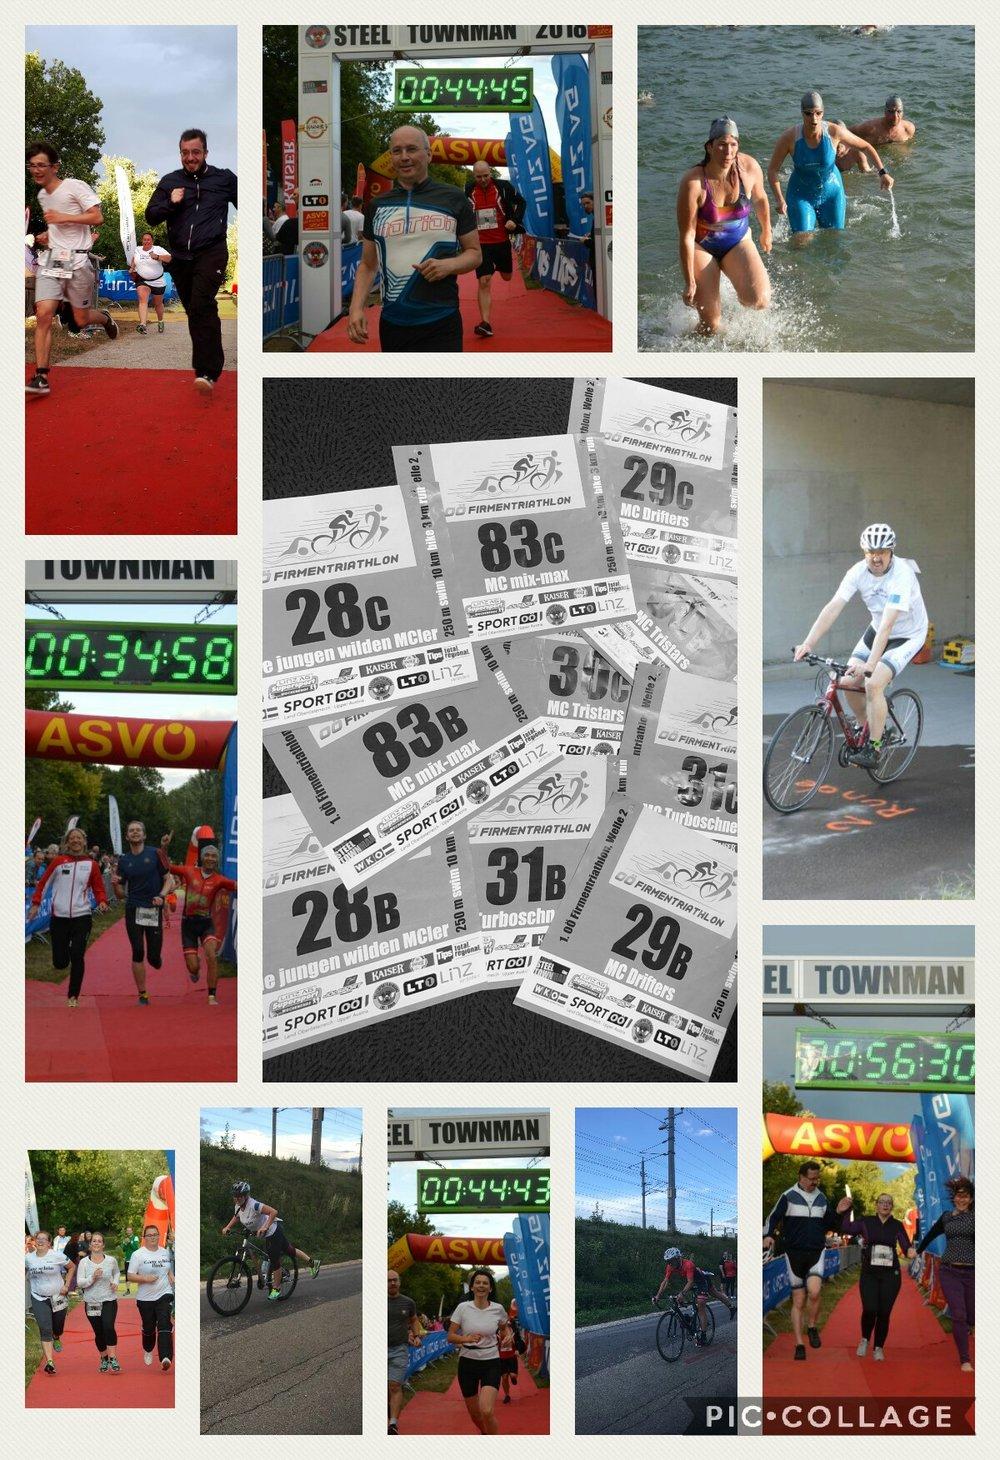 Collage 2018-07-03 16_35_32 (1).jpg